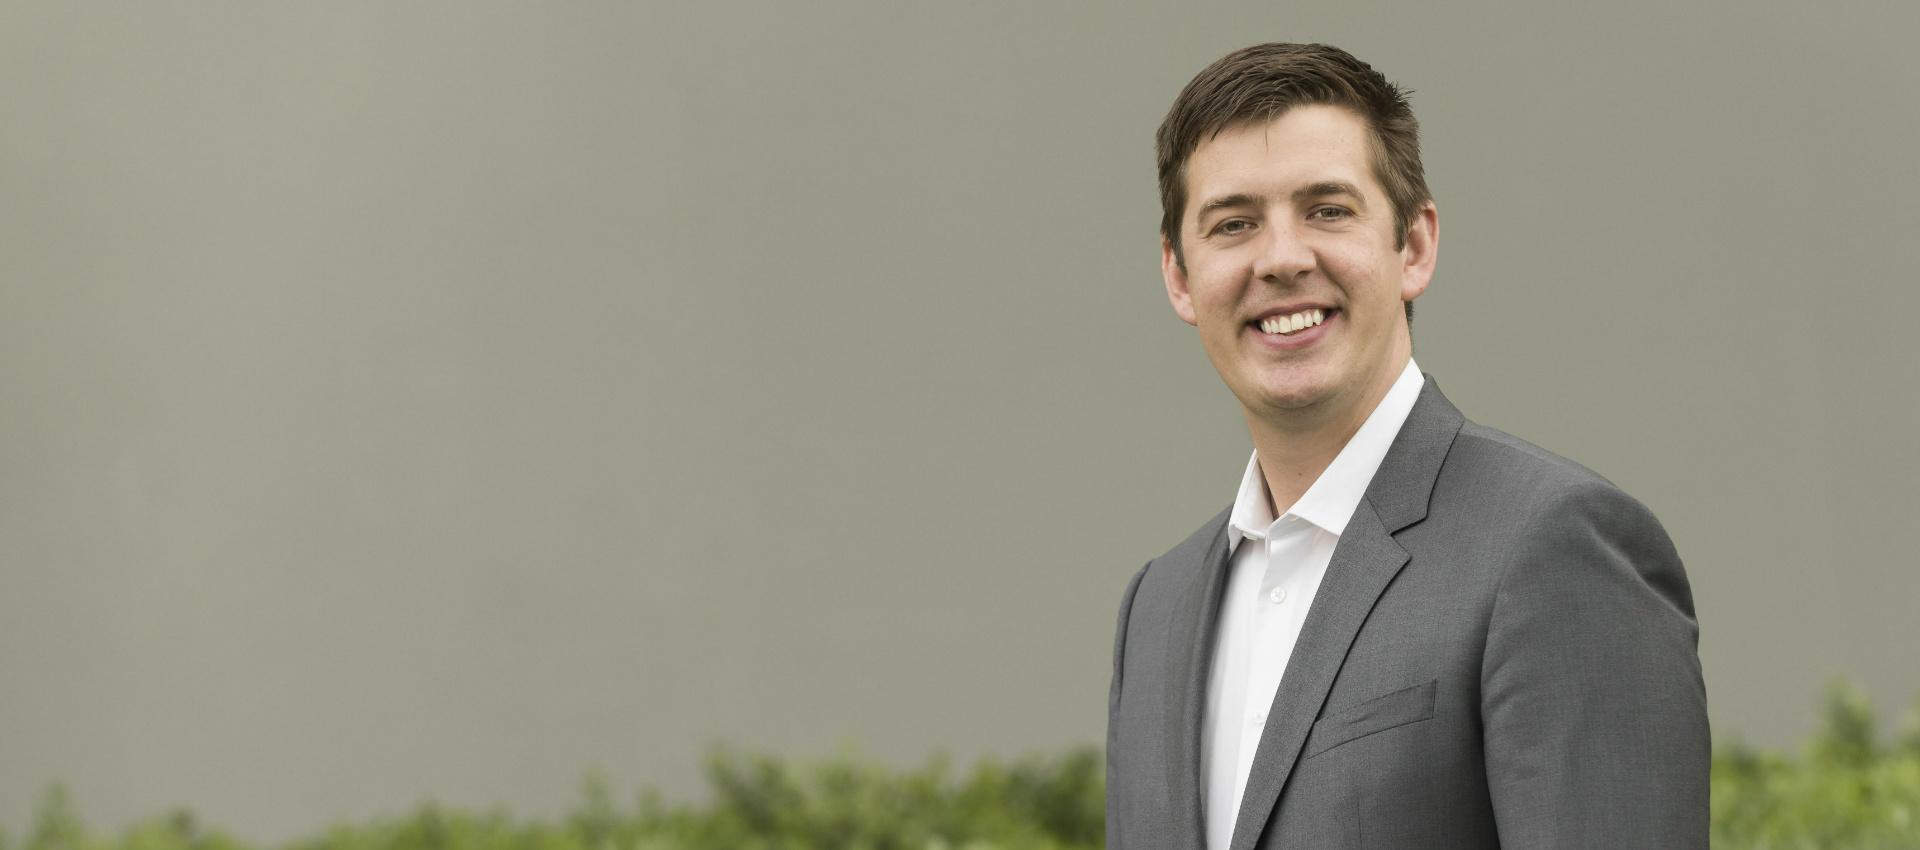 Steve McLeod Courage for Profit